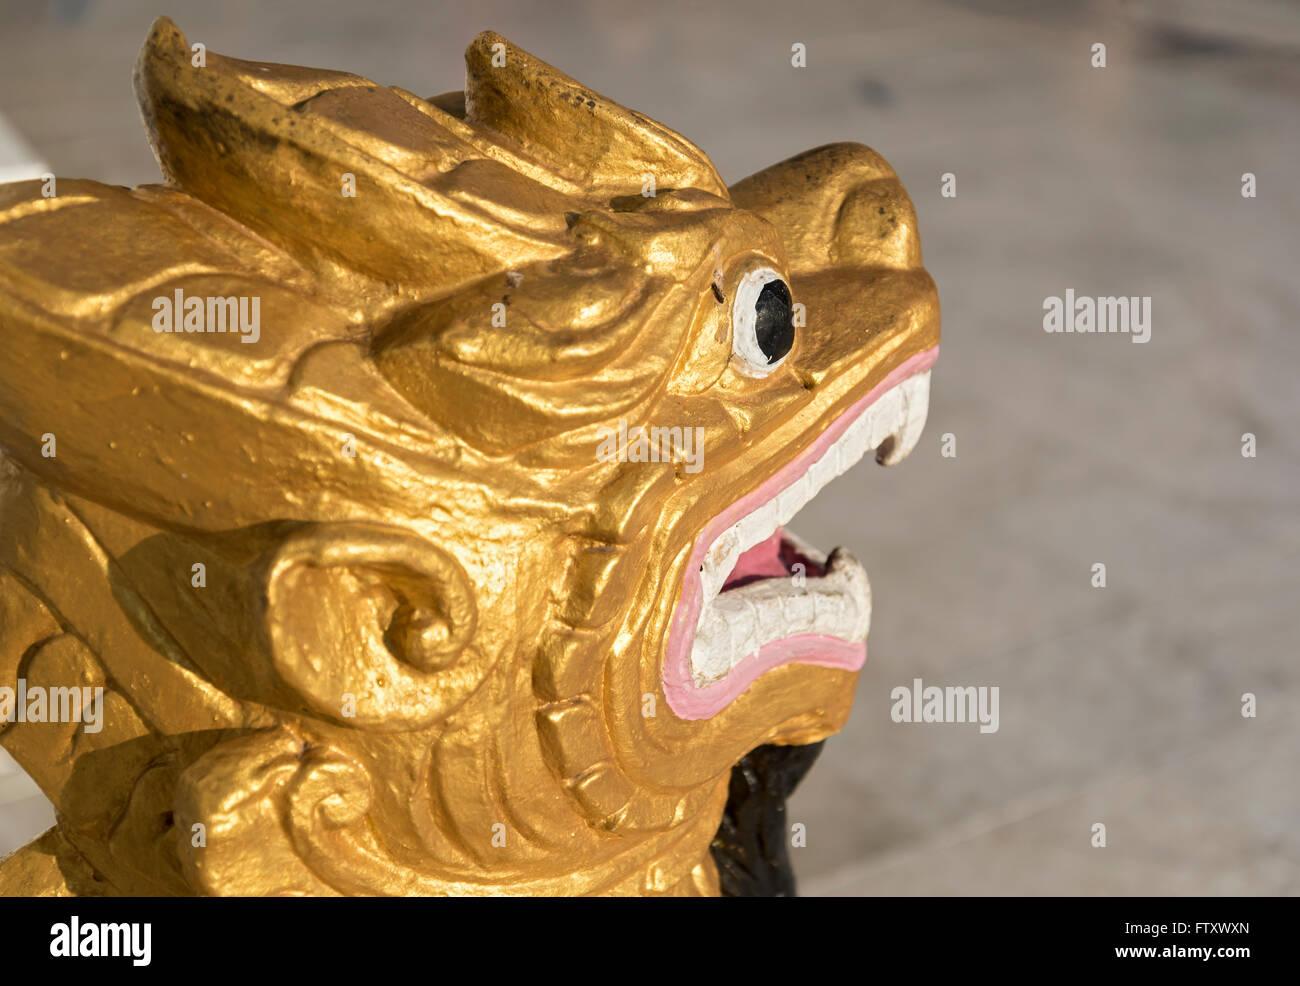 Deity Dagon Stock Photos & Deity Dagon Stock Images - Alamy